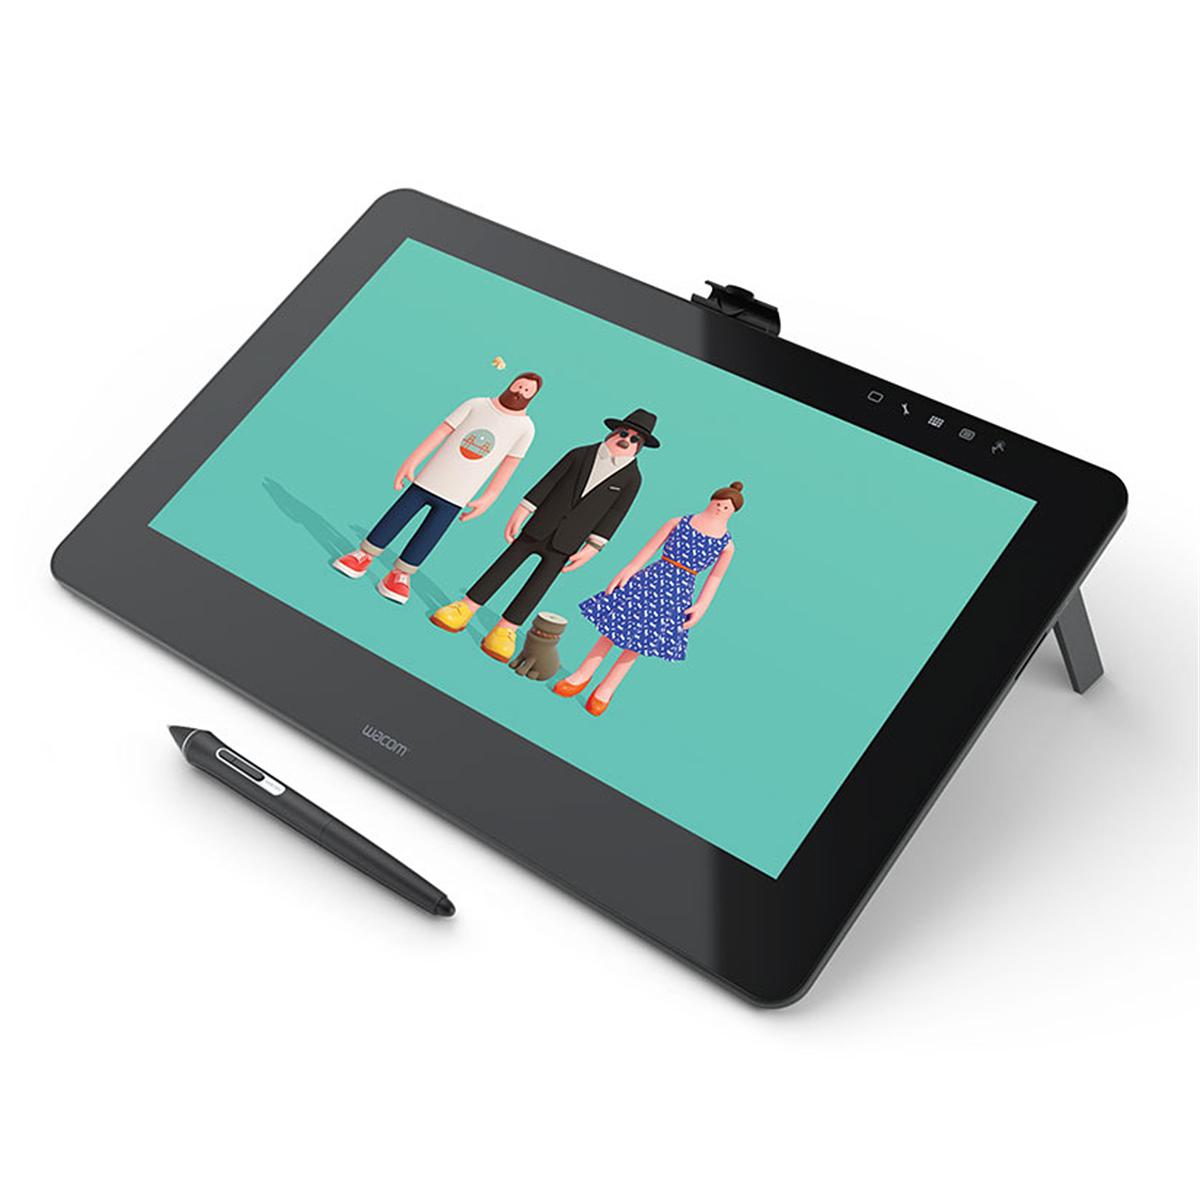 Wacom Cintiq Pro 16 comes with UHD screen and 94% Adobe RGB